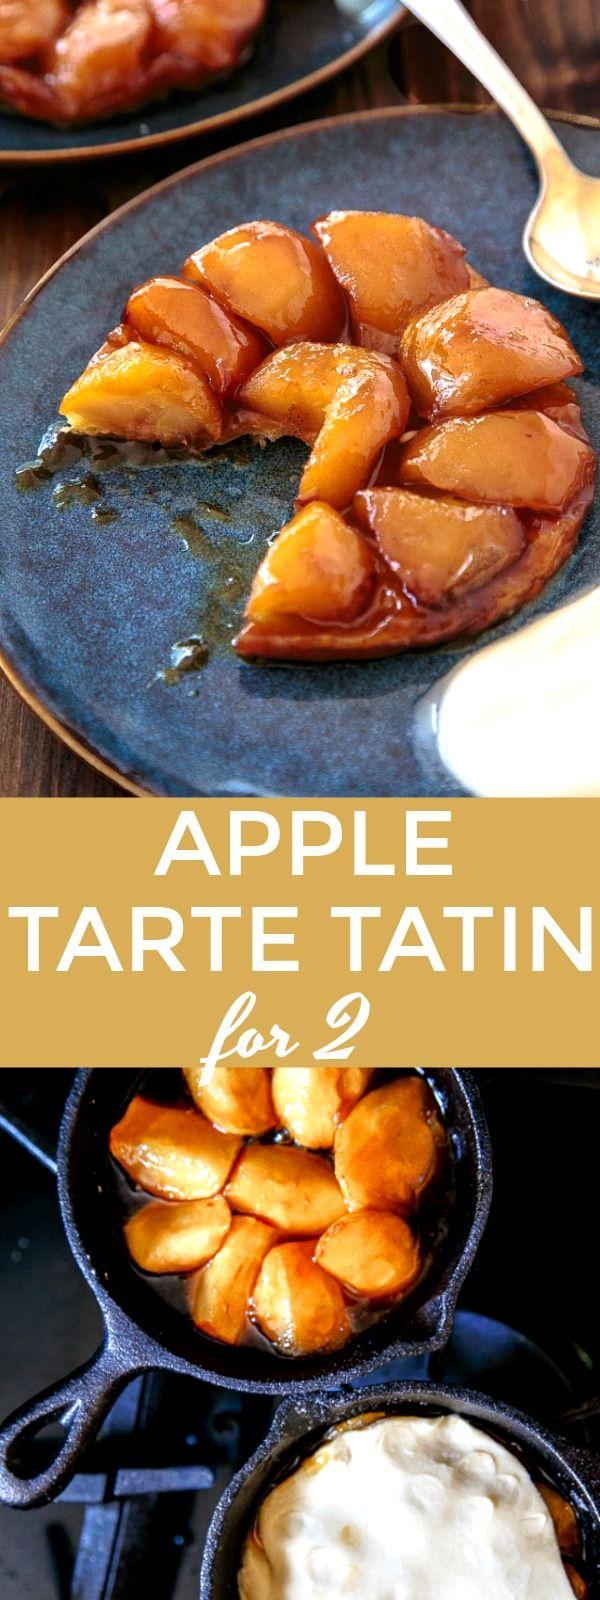 Apple Tarte Tatin for two via @dessertfortwo